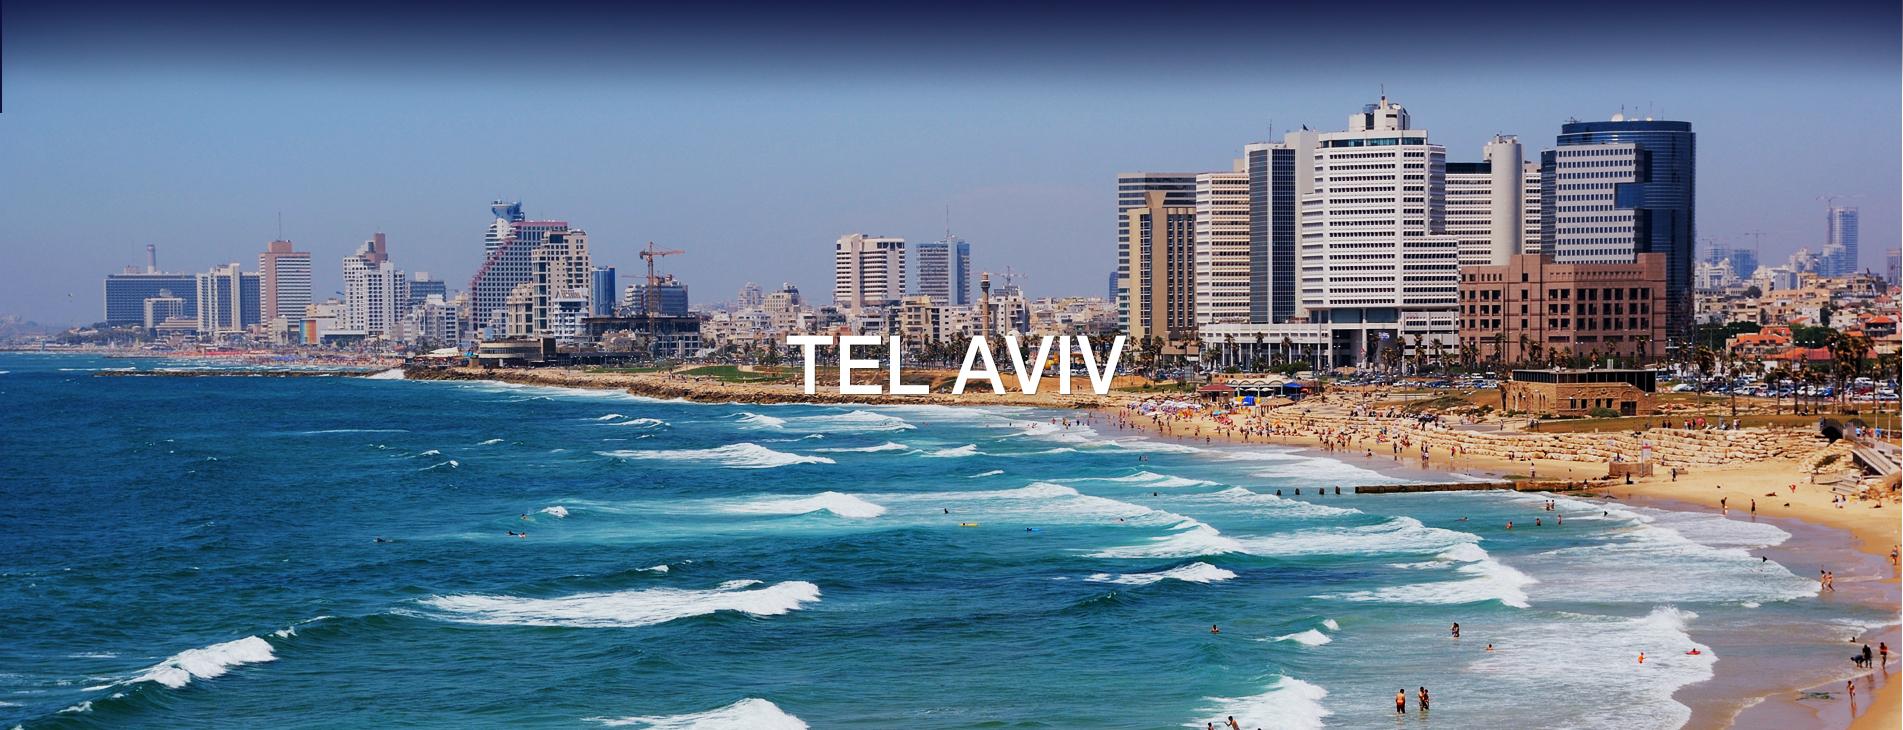 Tel-aviv4